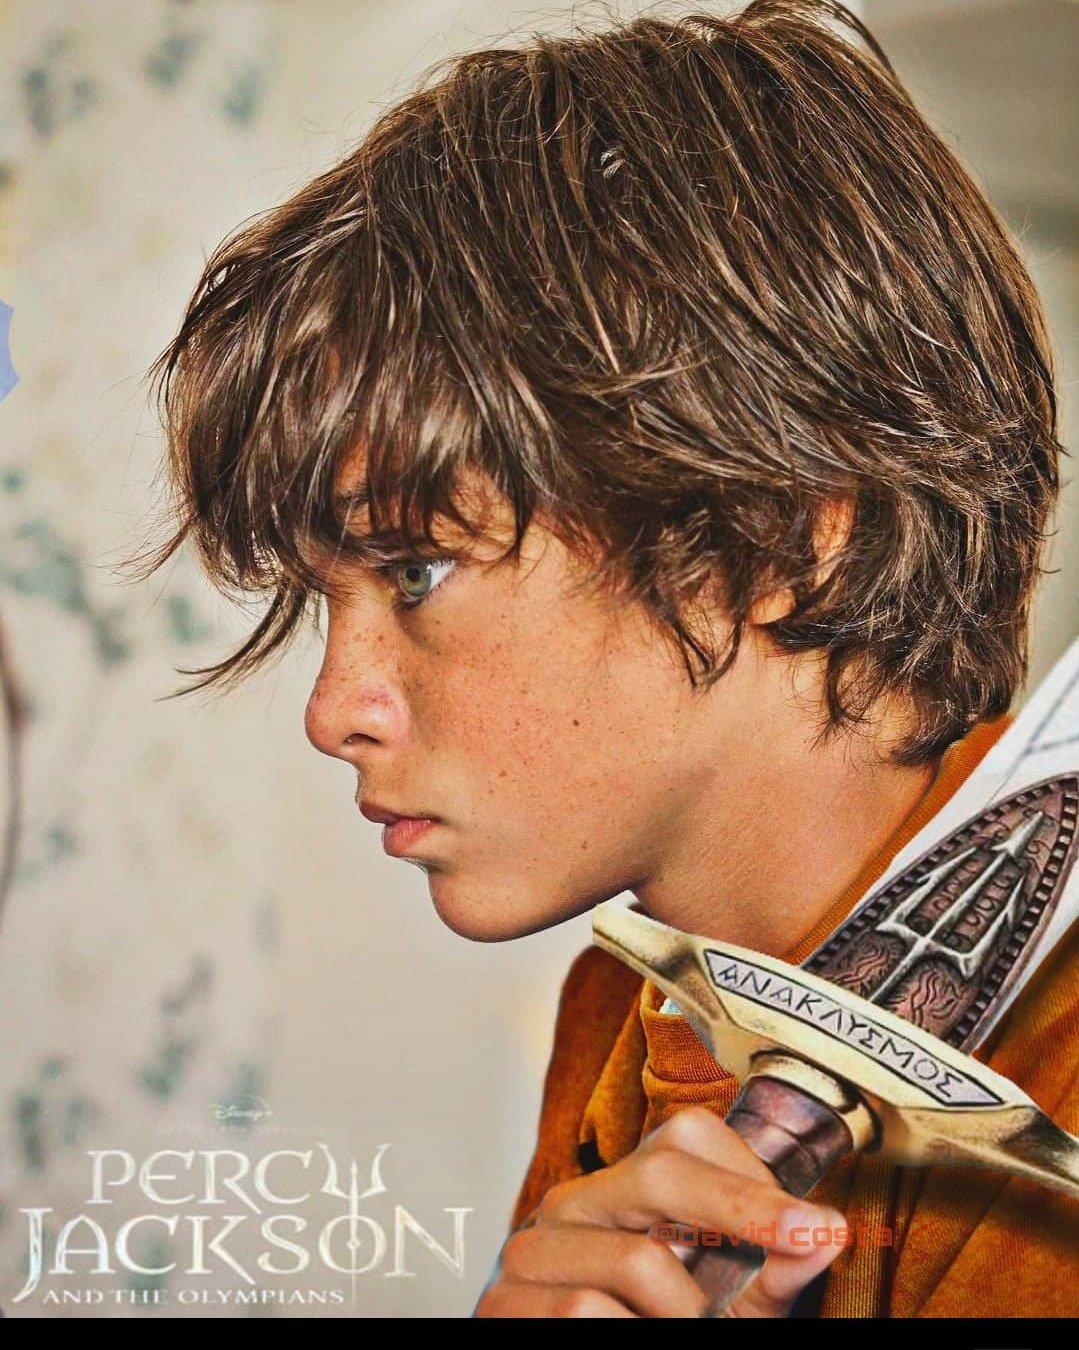 Jorge Benito, fã da saga Percy Jackson.